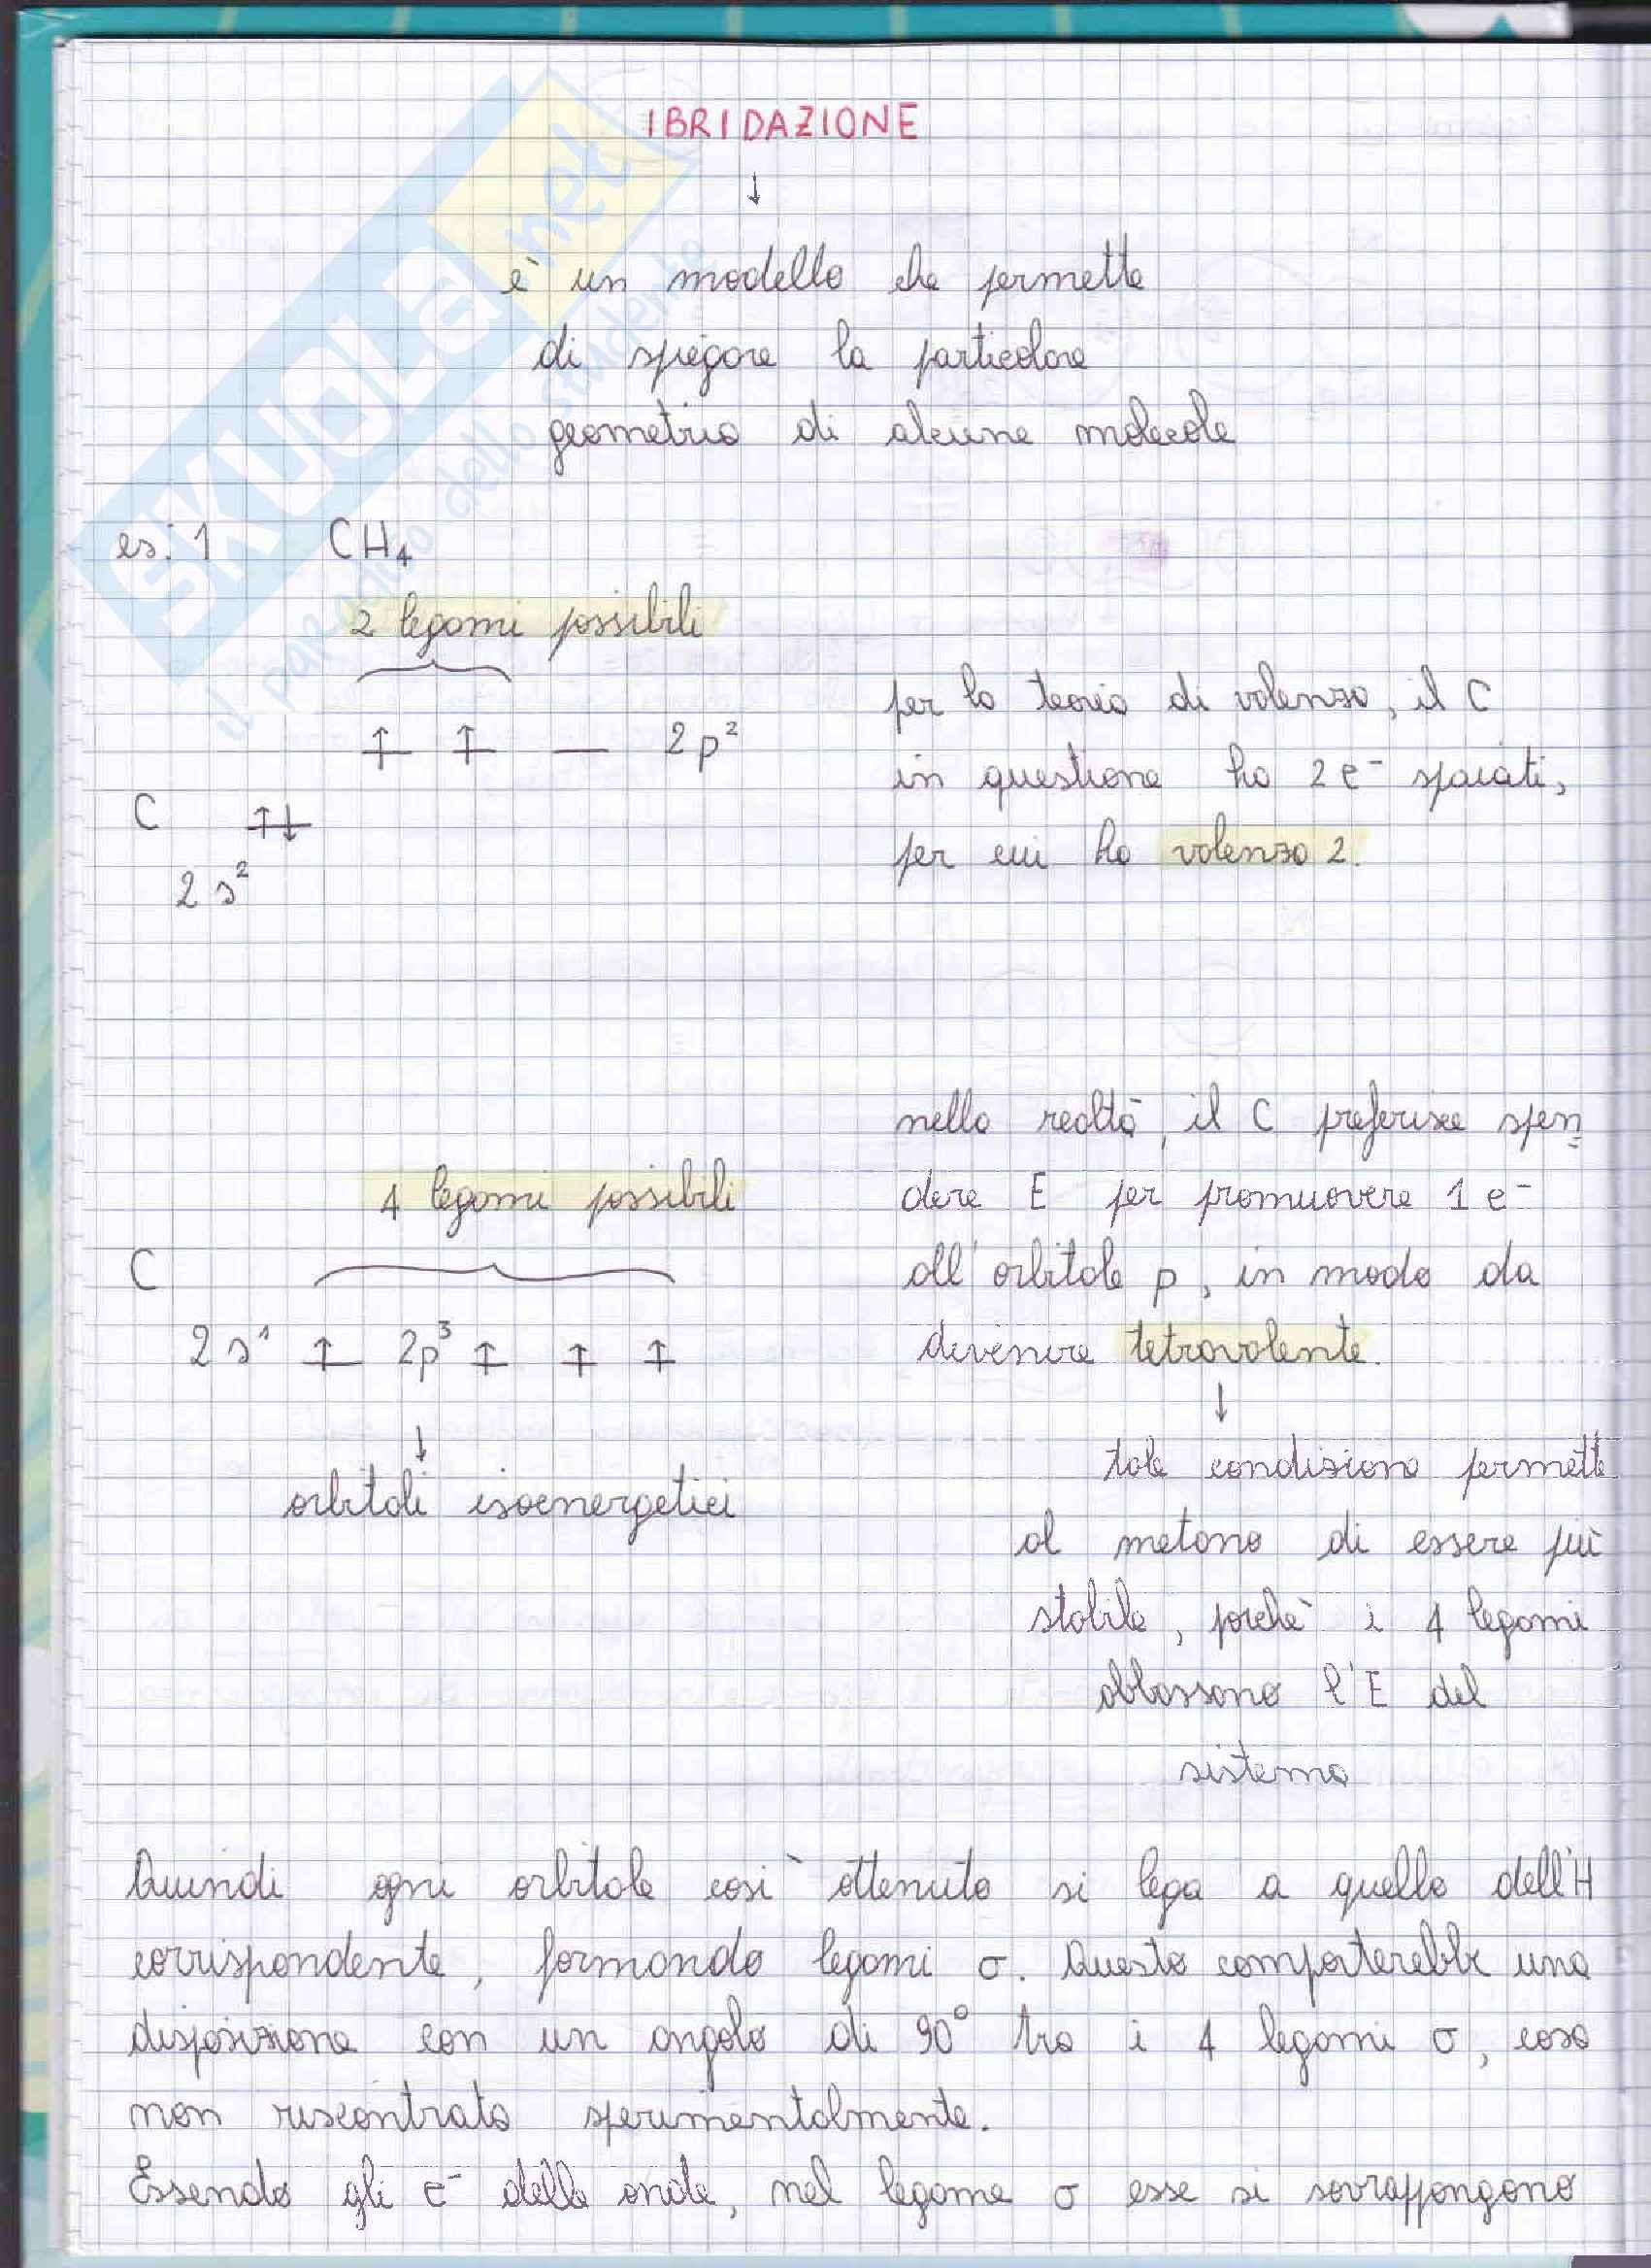 Parte 1, Chimica Generale Pag. 36